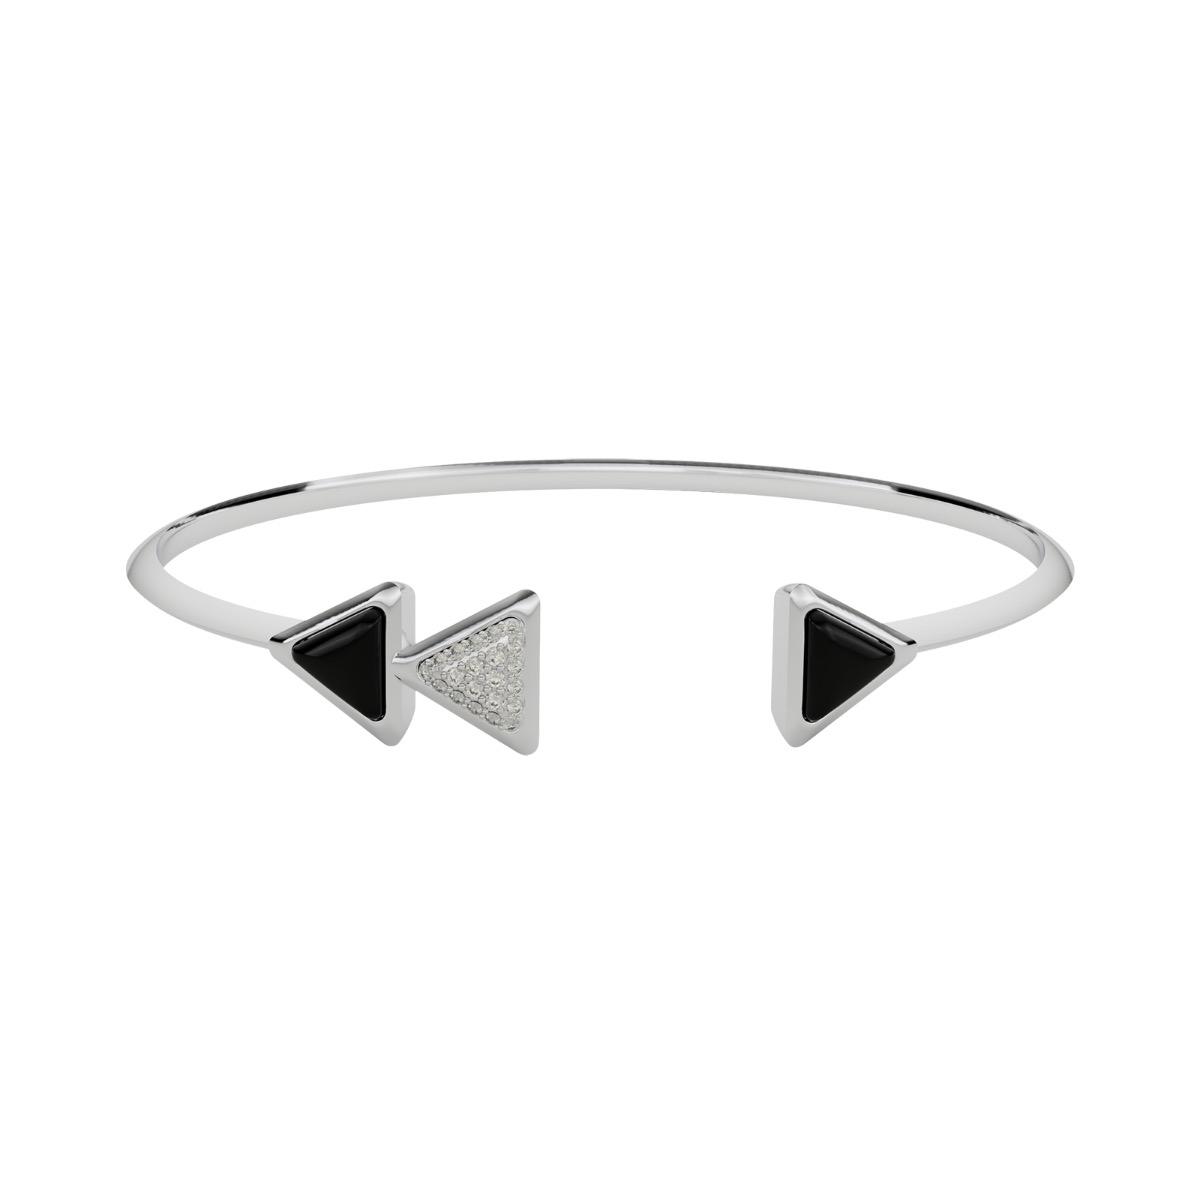 Bracelet Dove Vai Rewind Exquisite White Gold Onix and Diamonds